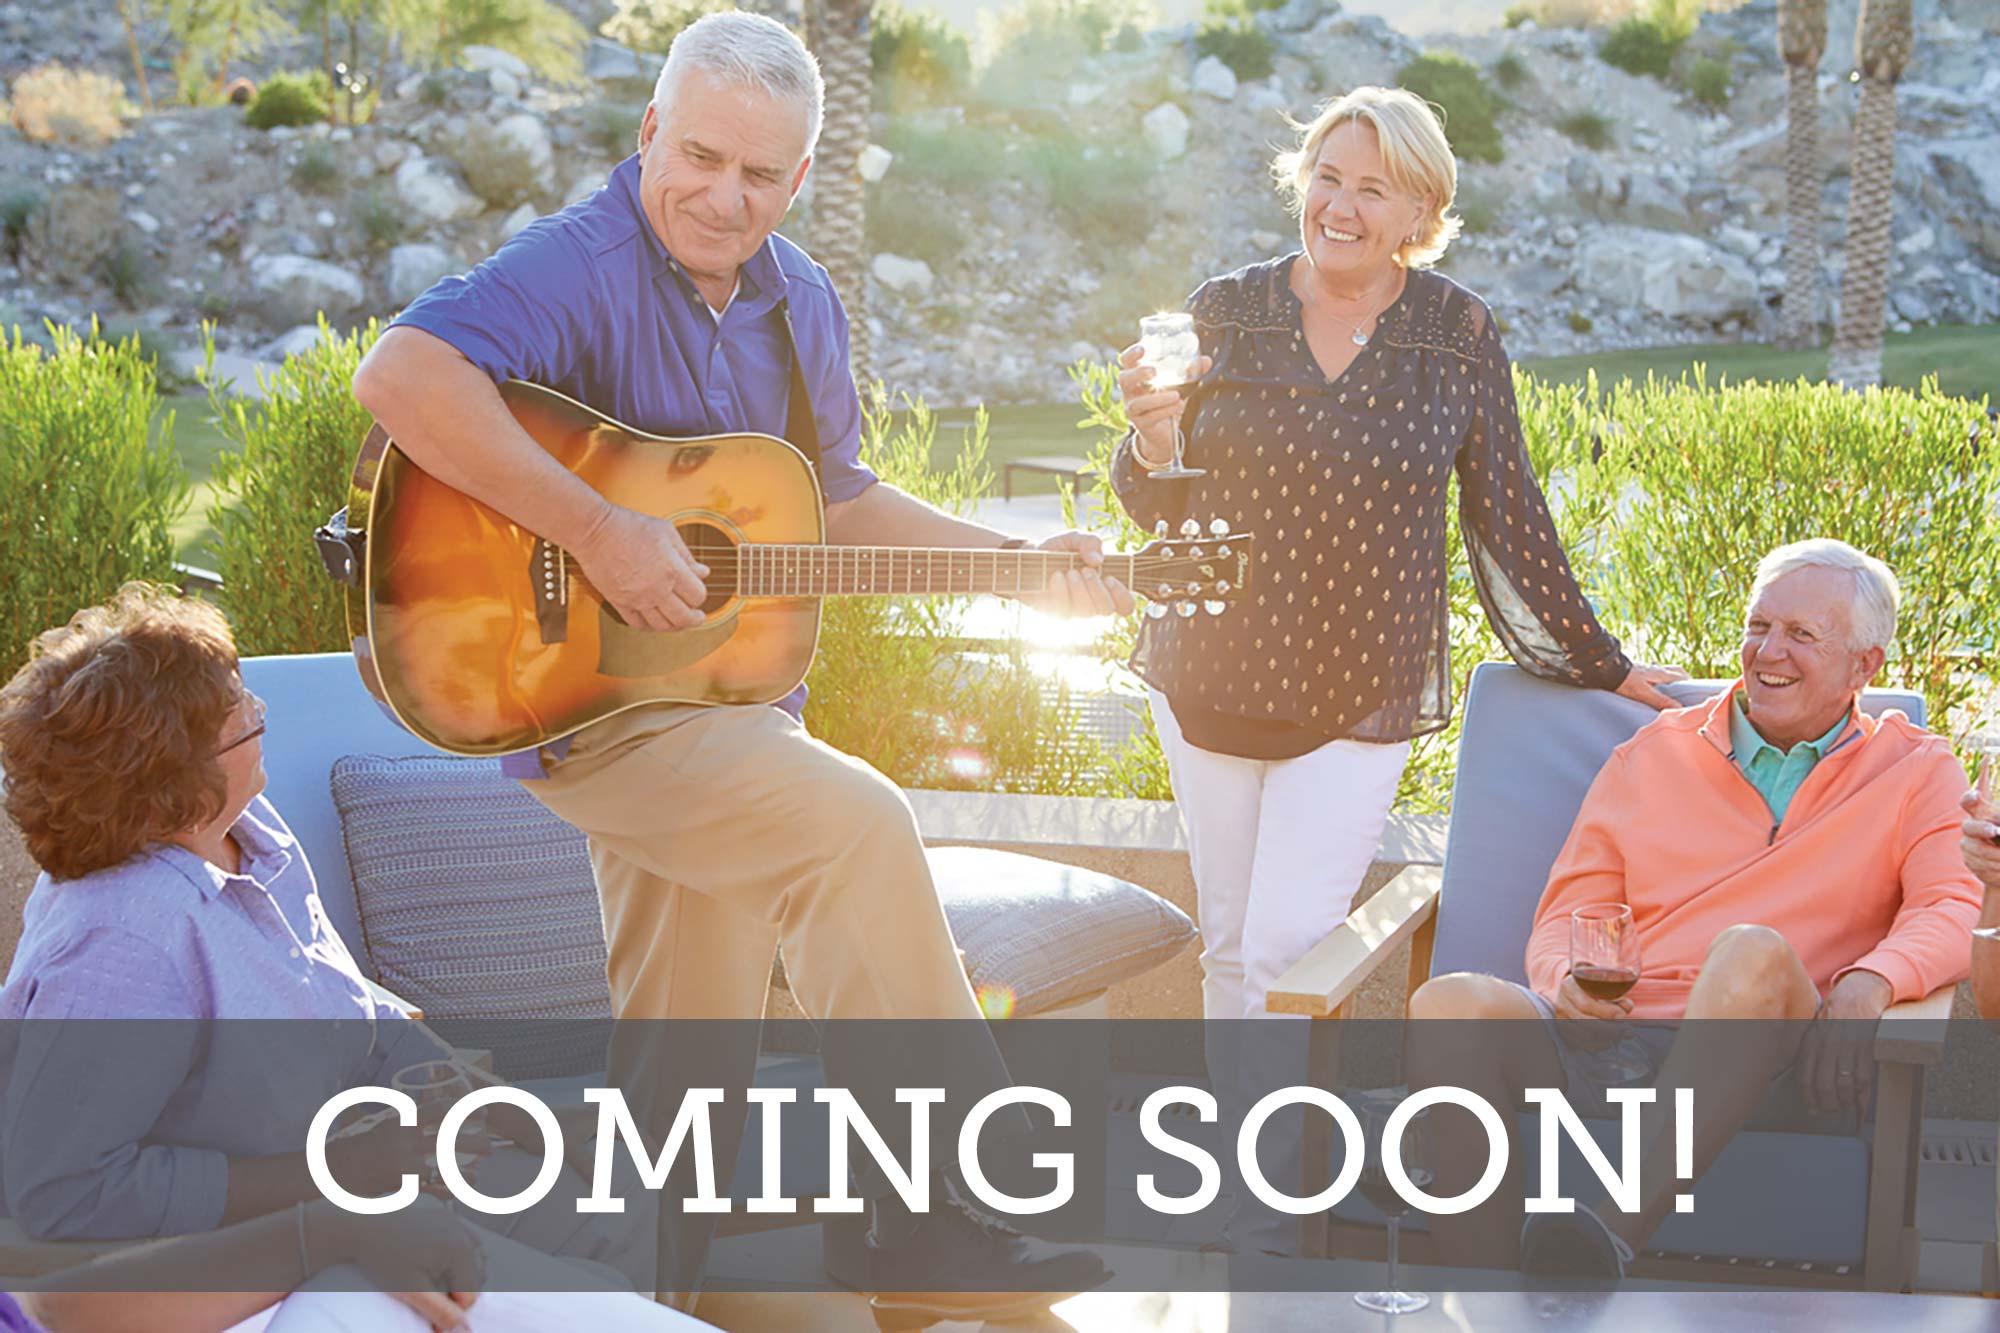 Glenhaven at Ridgewalk - Coming Soon